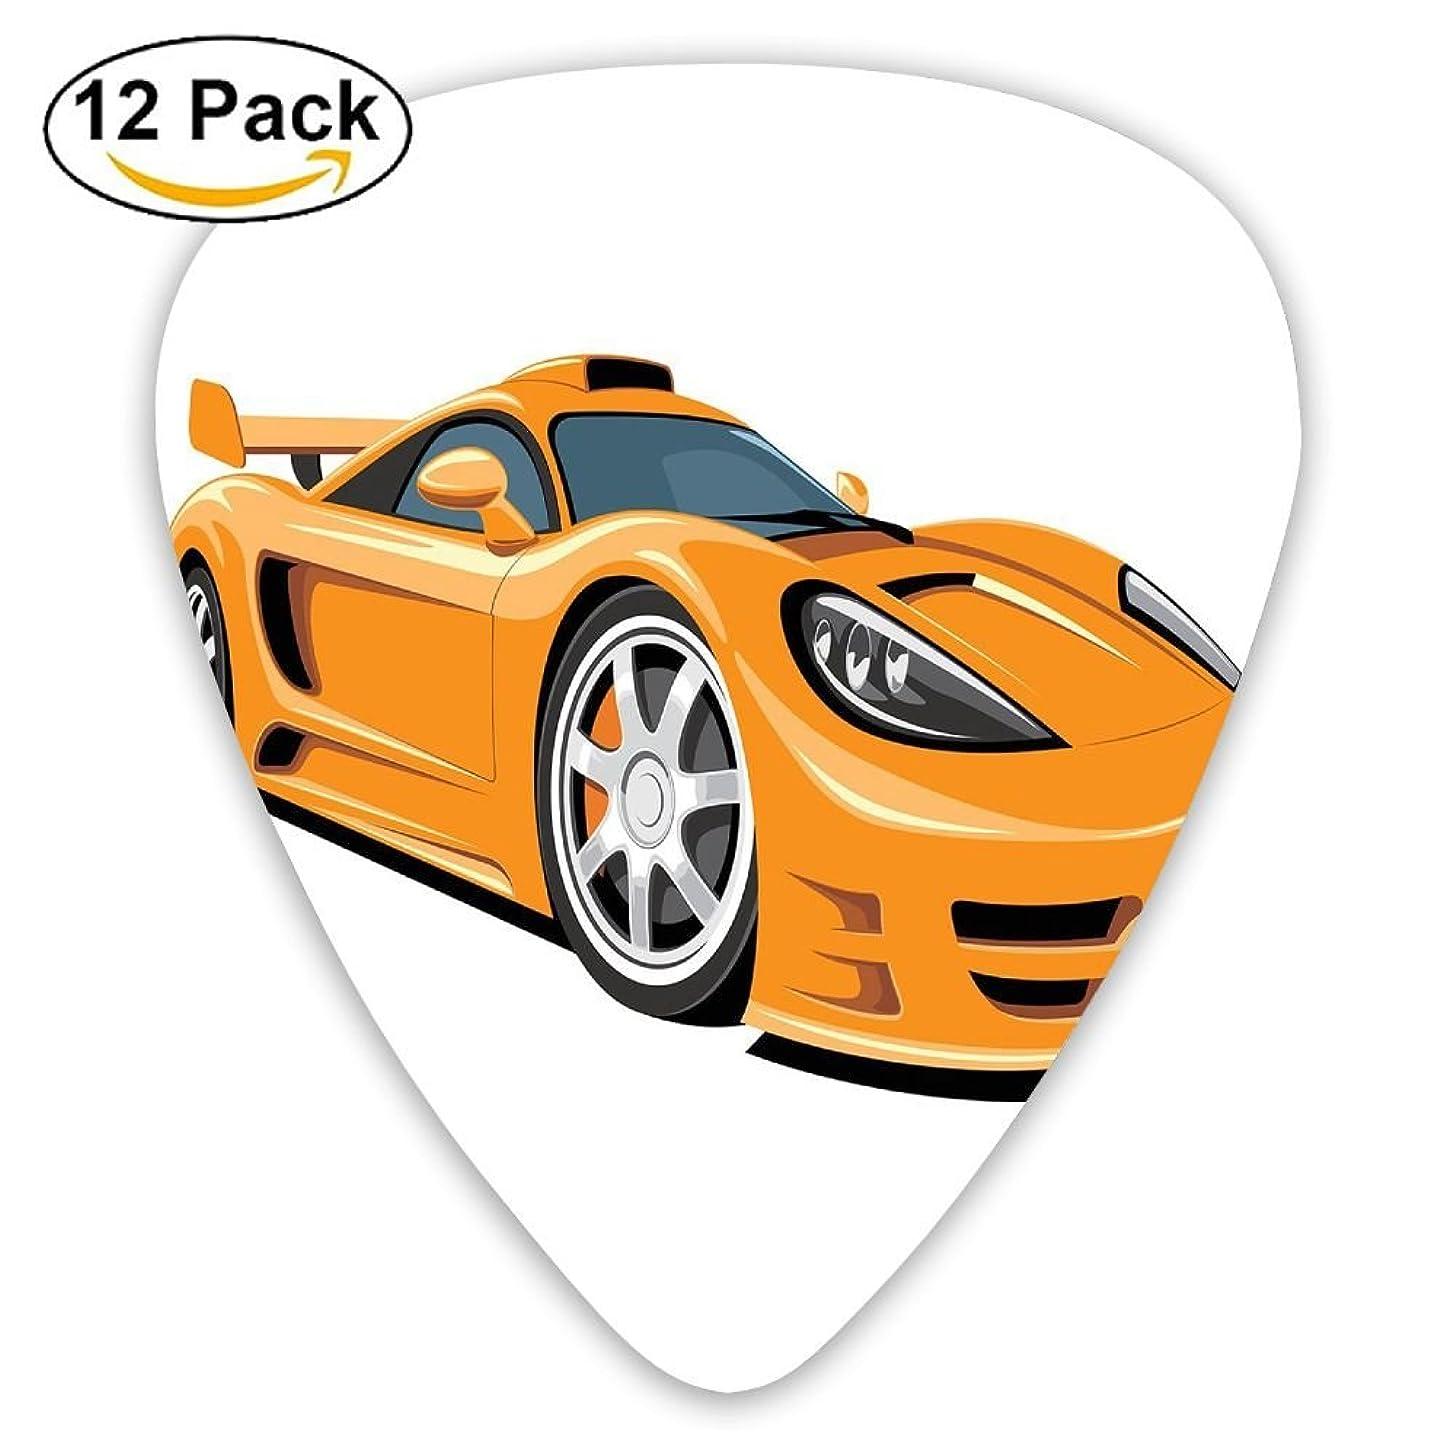 Newfood Ss Orange Sports Car Fast Racing Roadster Modern Automotive Technology Guitar Picks 12/Pack Set